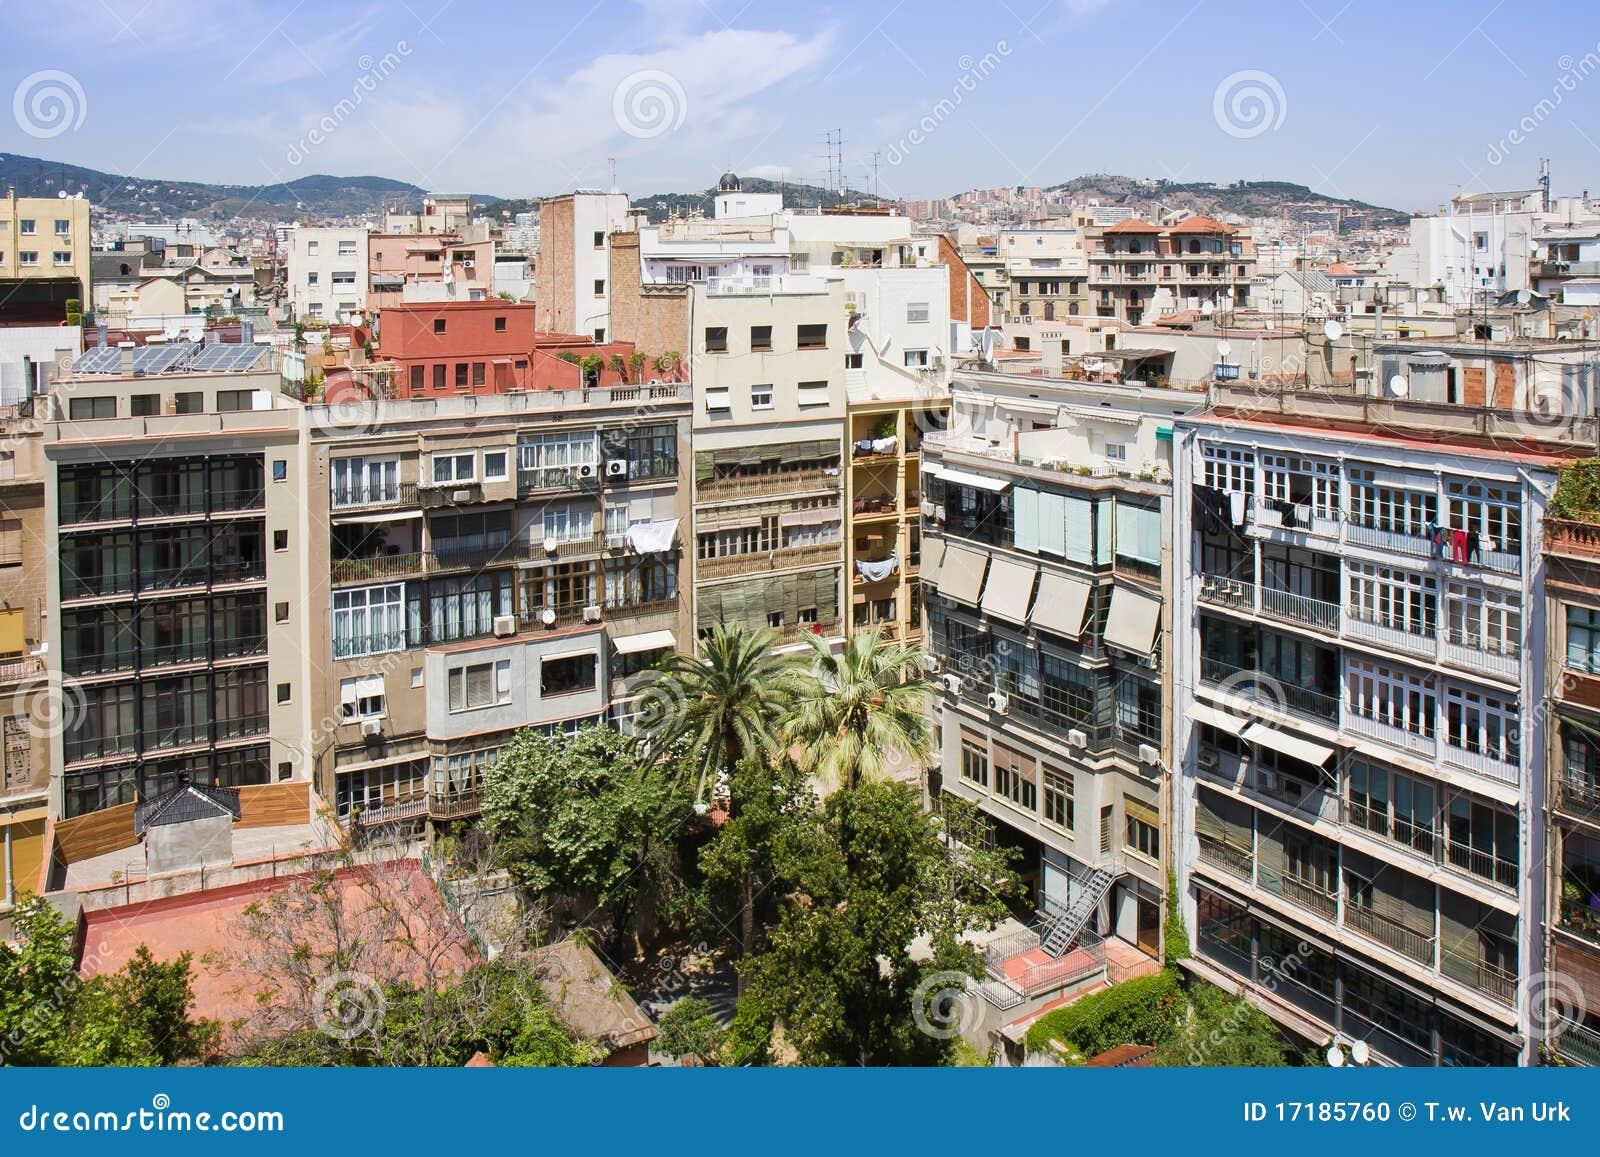 Paisaje urbano de barcelona de la azotea de las casas mila for La azotea de la casa de granada